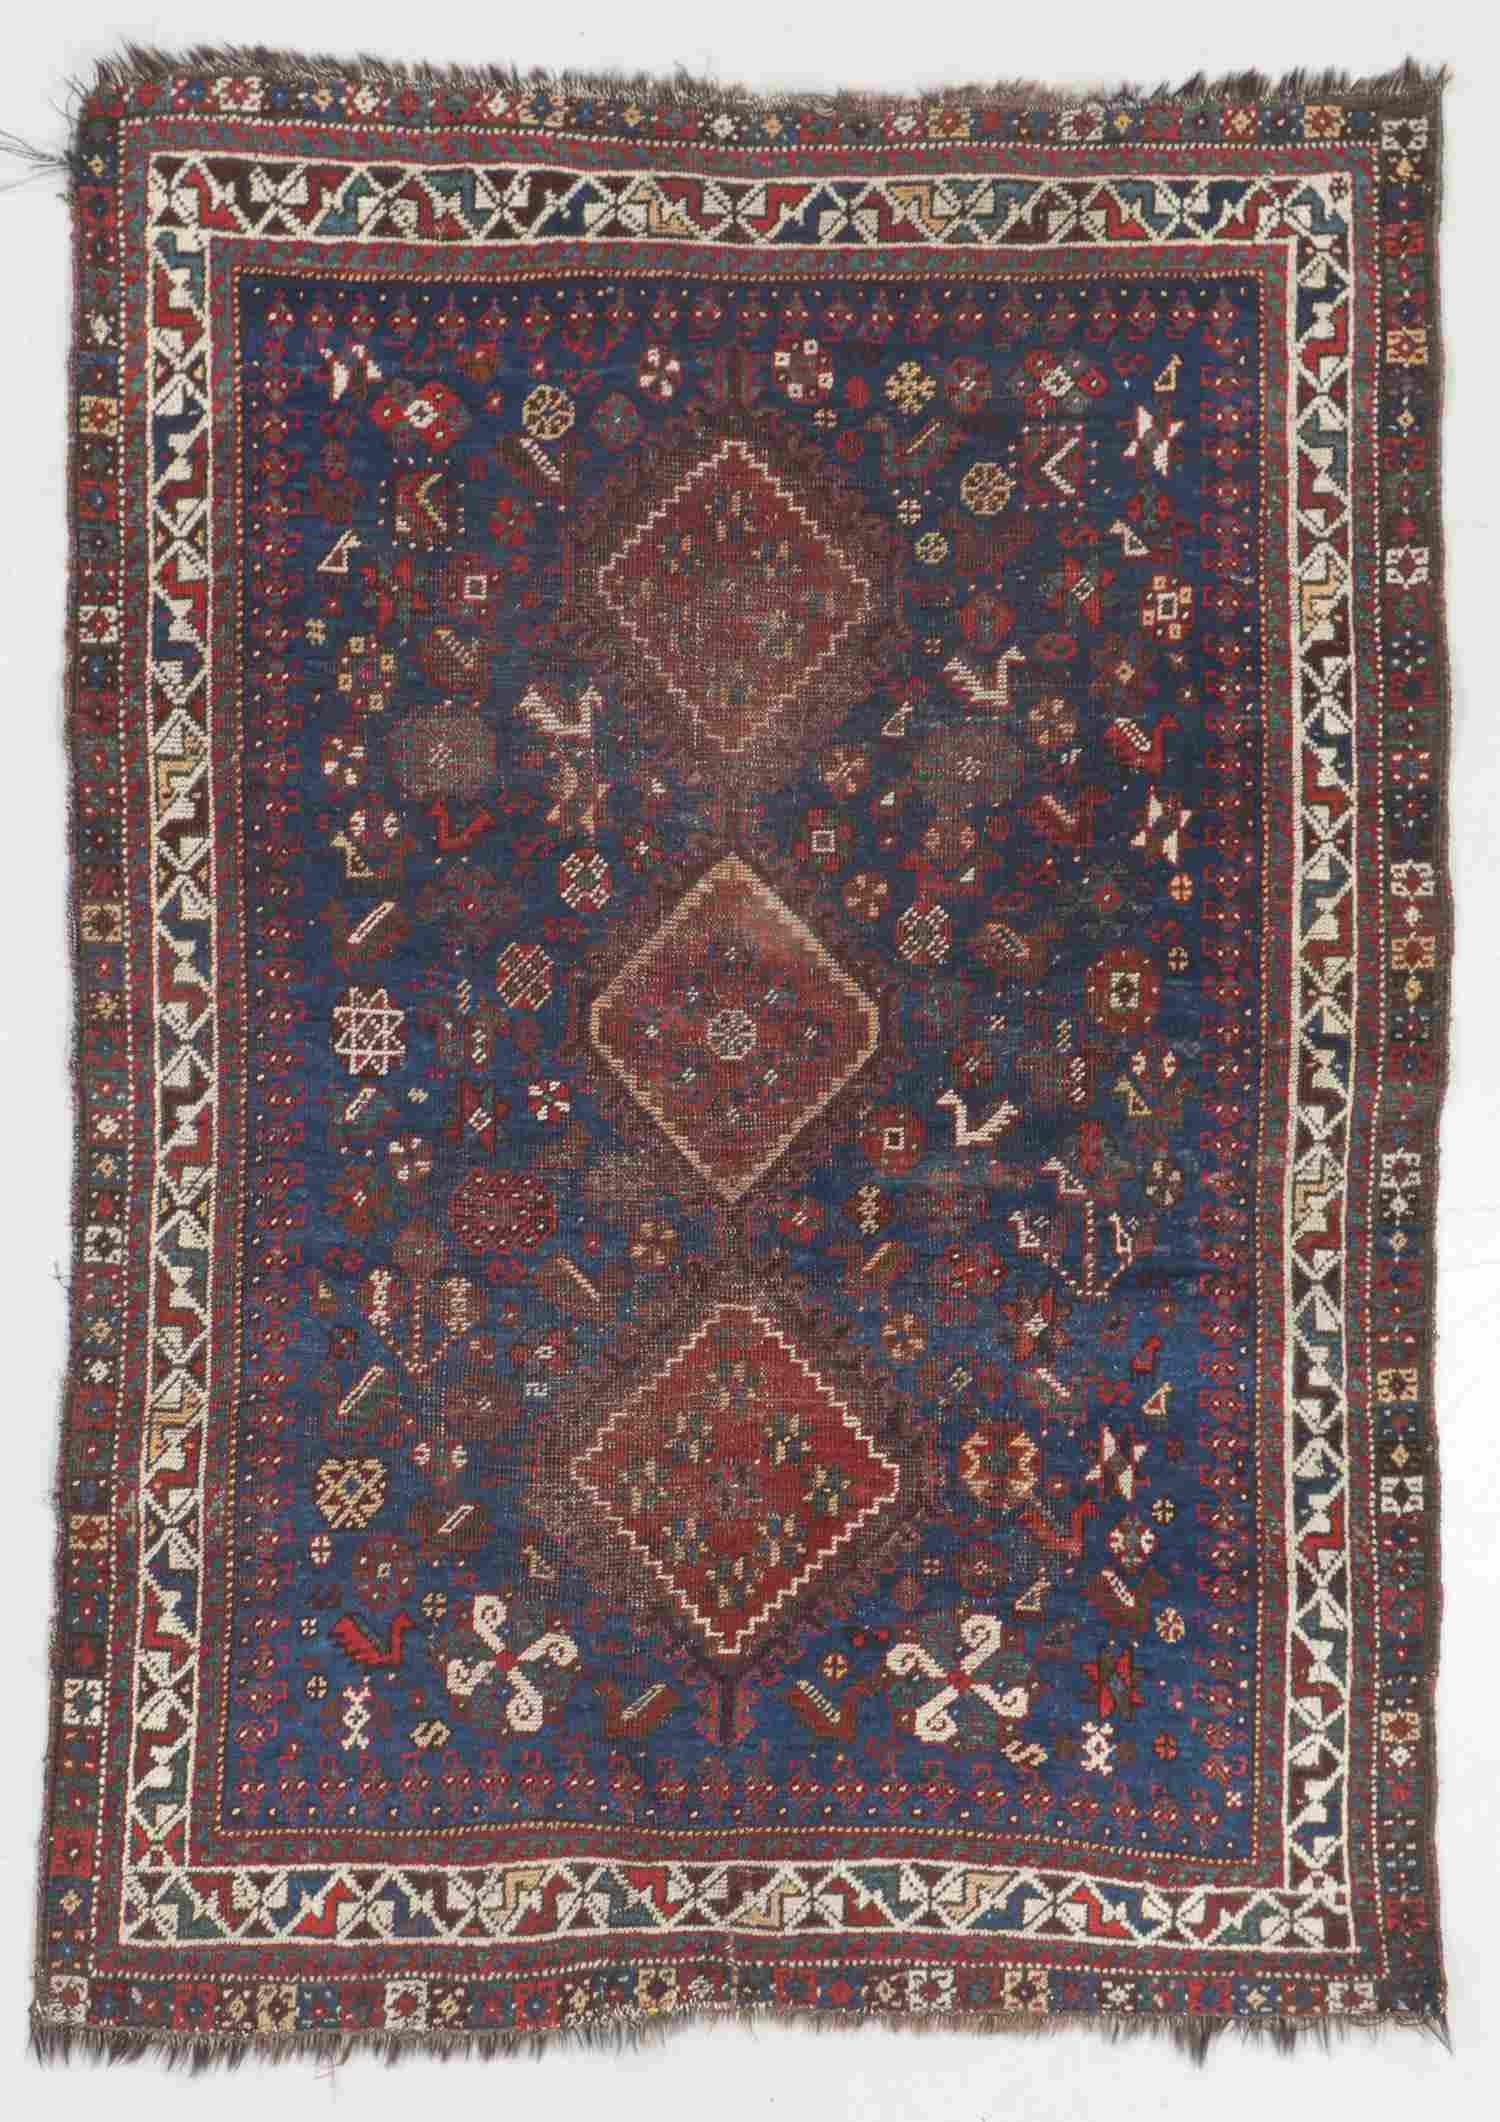 Antique Afshar Rug, Persia: 3'10'' x 5'3''